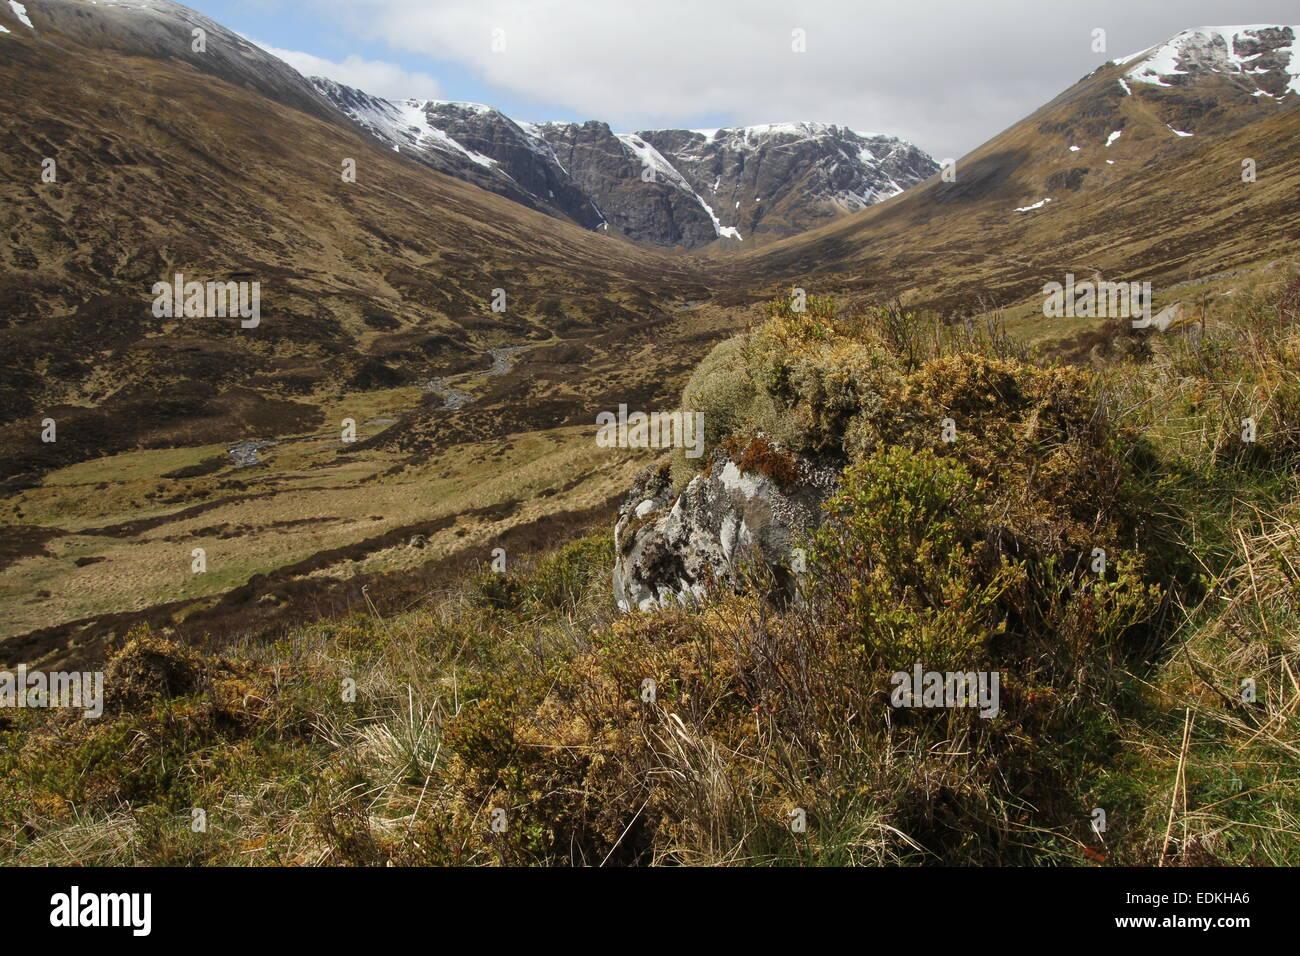 Scottish Mountain scenery - Stock Image